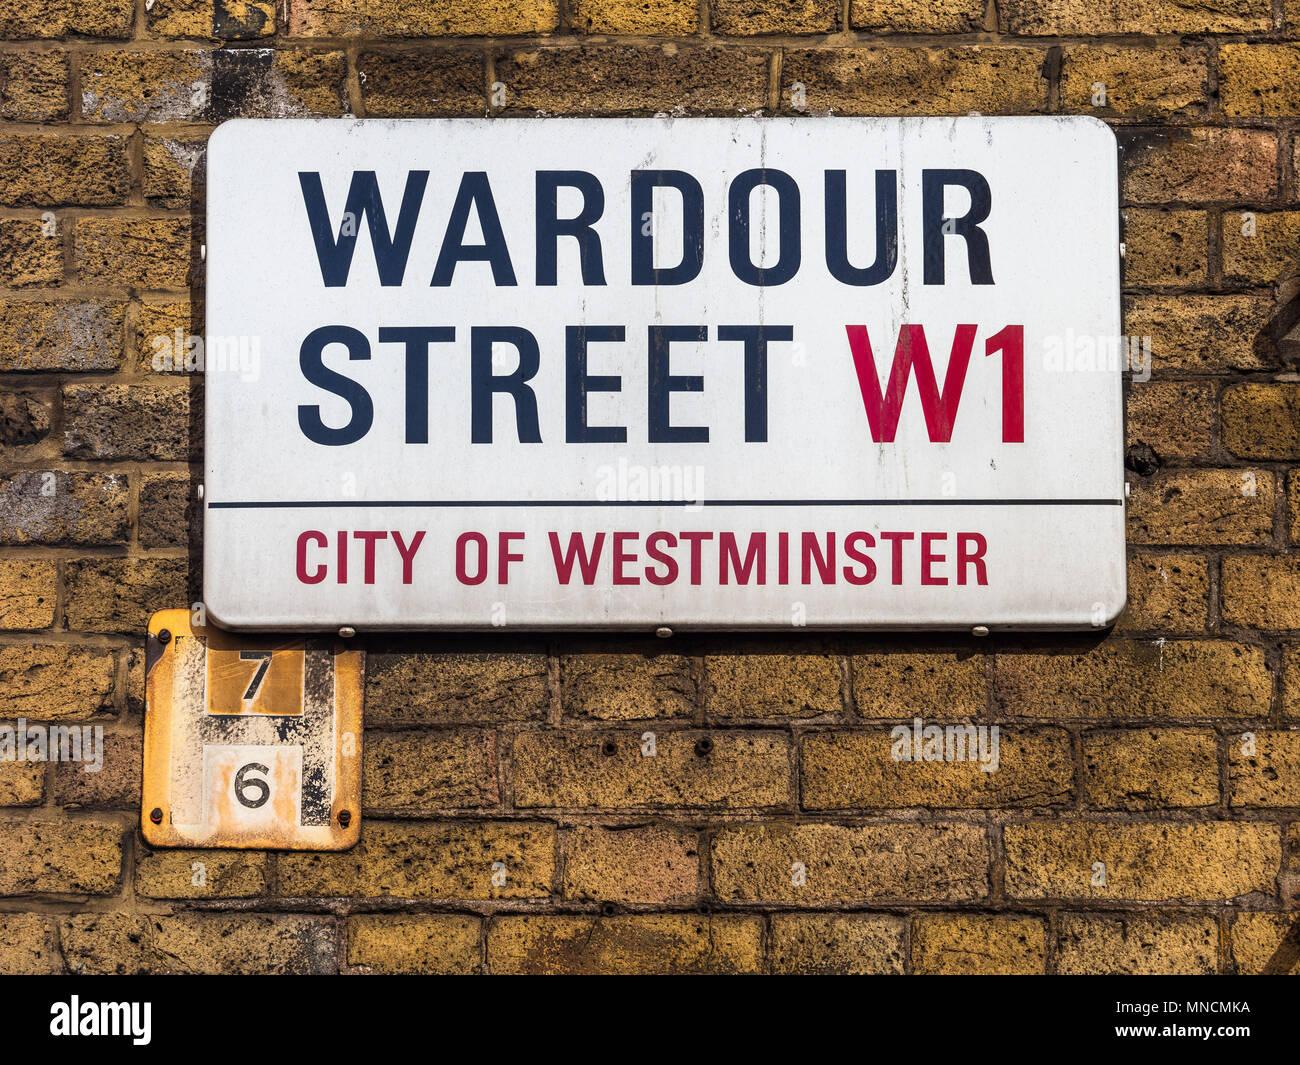 Soho Street Signs Series - Wardour Street - London's Soho district Street Signs - Stock Image